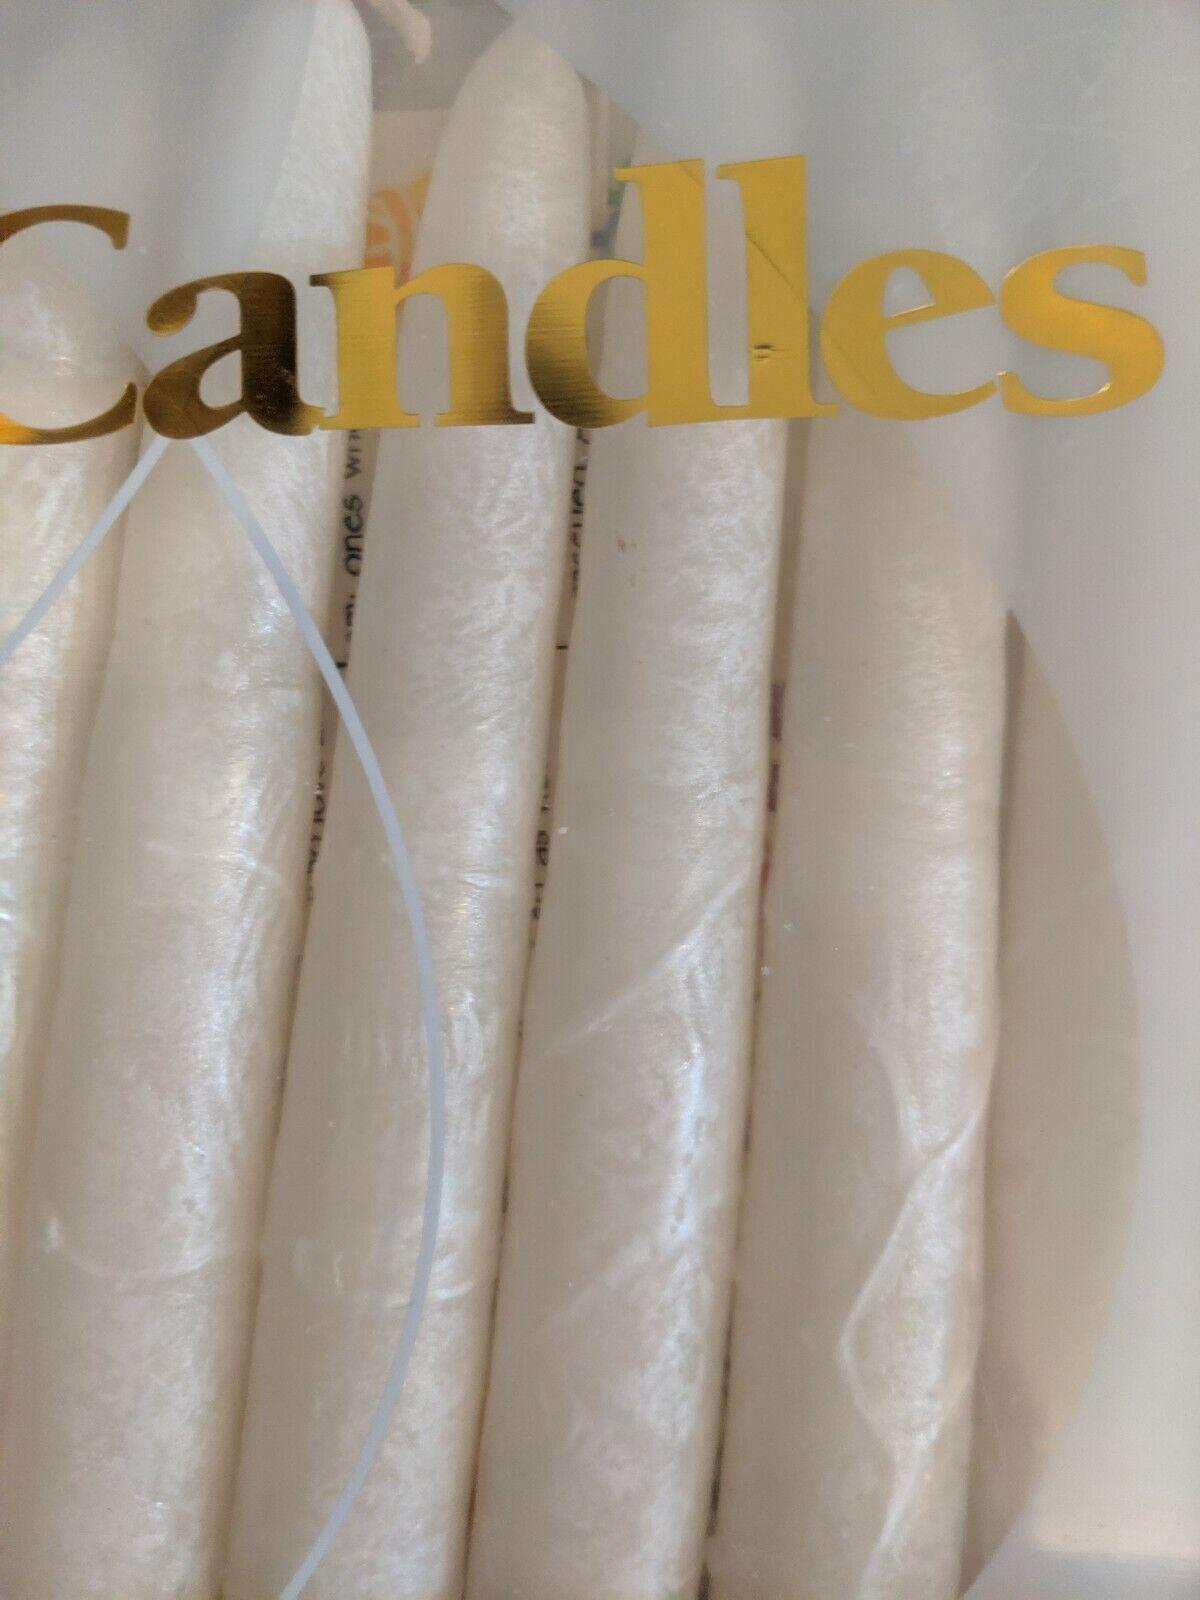 Rite Lite's Premium Hand-Crafted Shabbat & Holiday Candles Box of 12